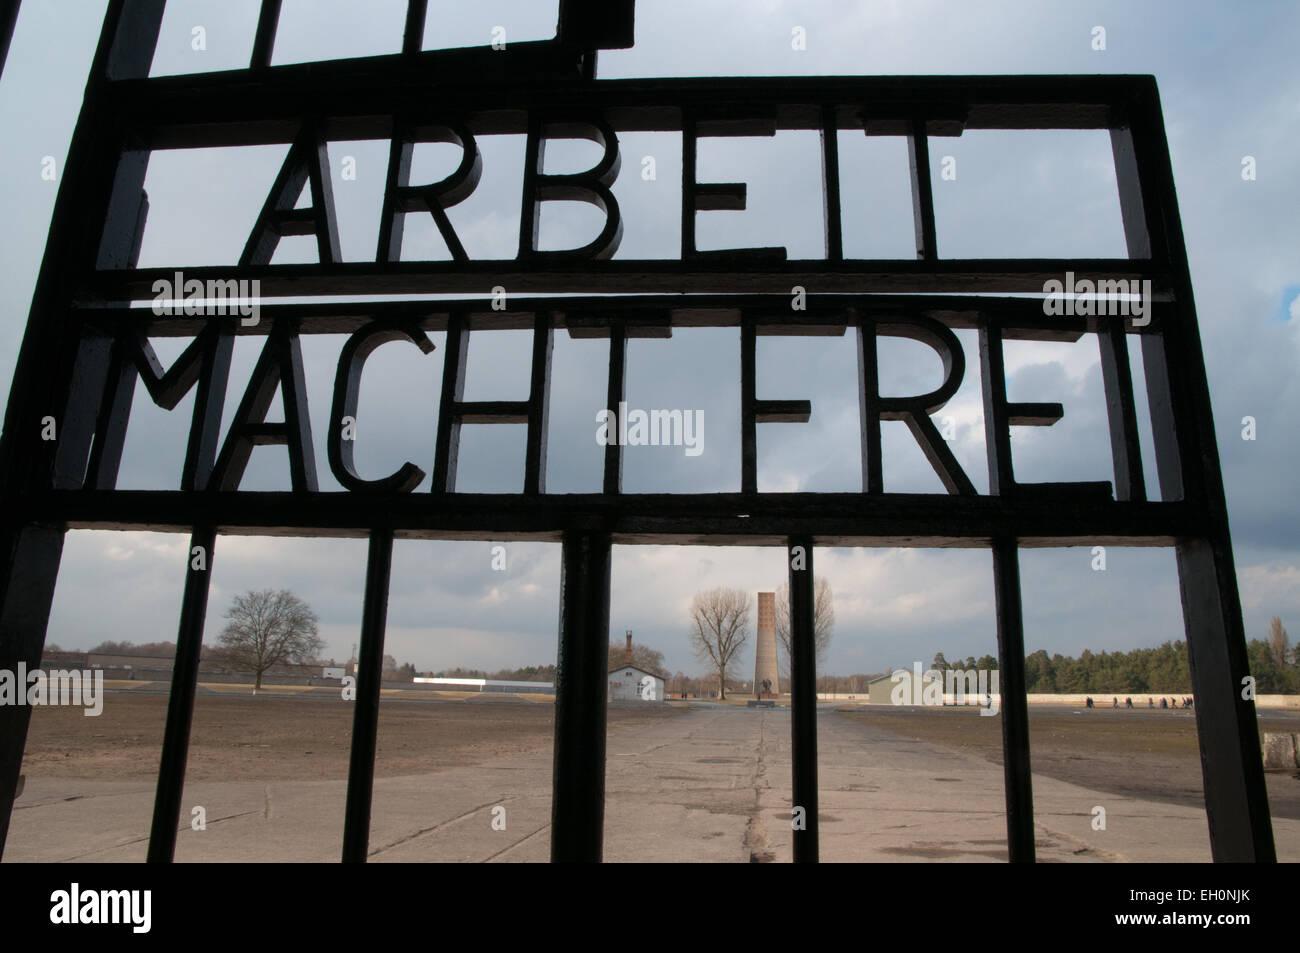 Arbeit Macht Frei sign on Sachsenhausen concentration camp memorial site, Oranienburg, Germany - Stock Image